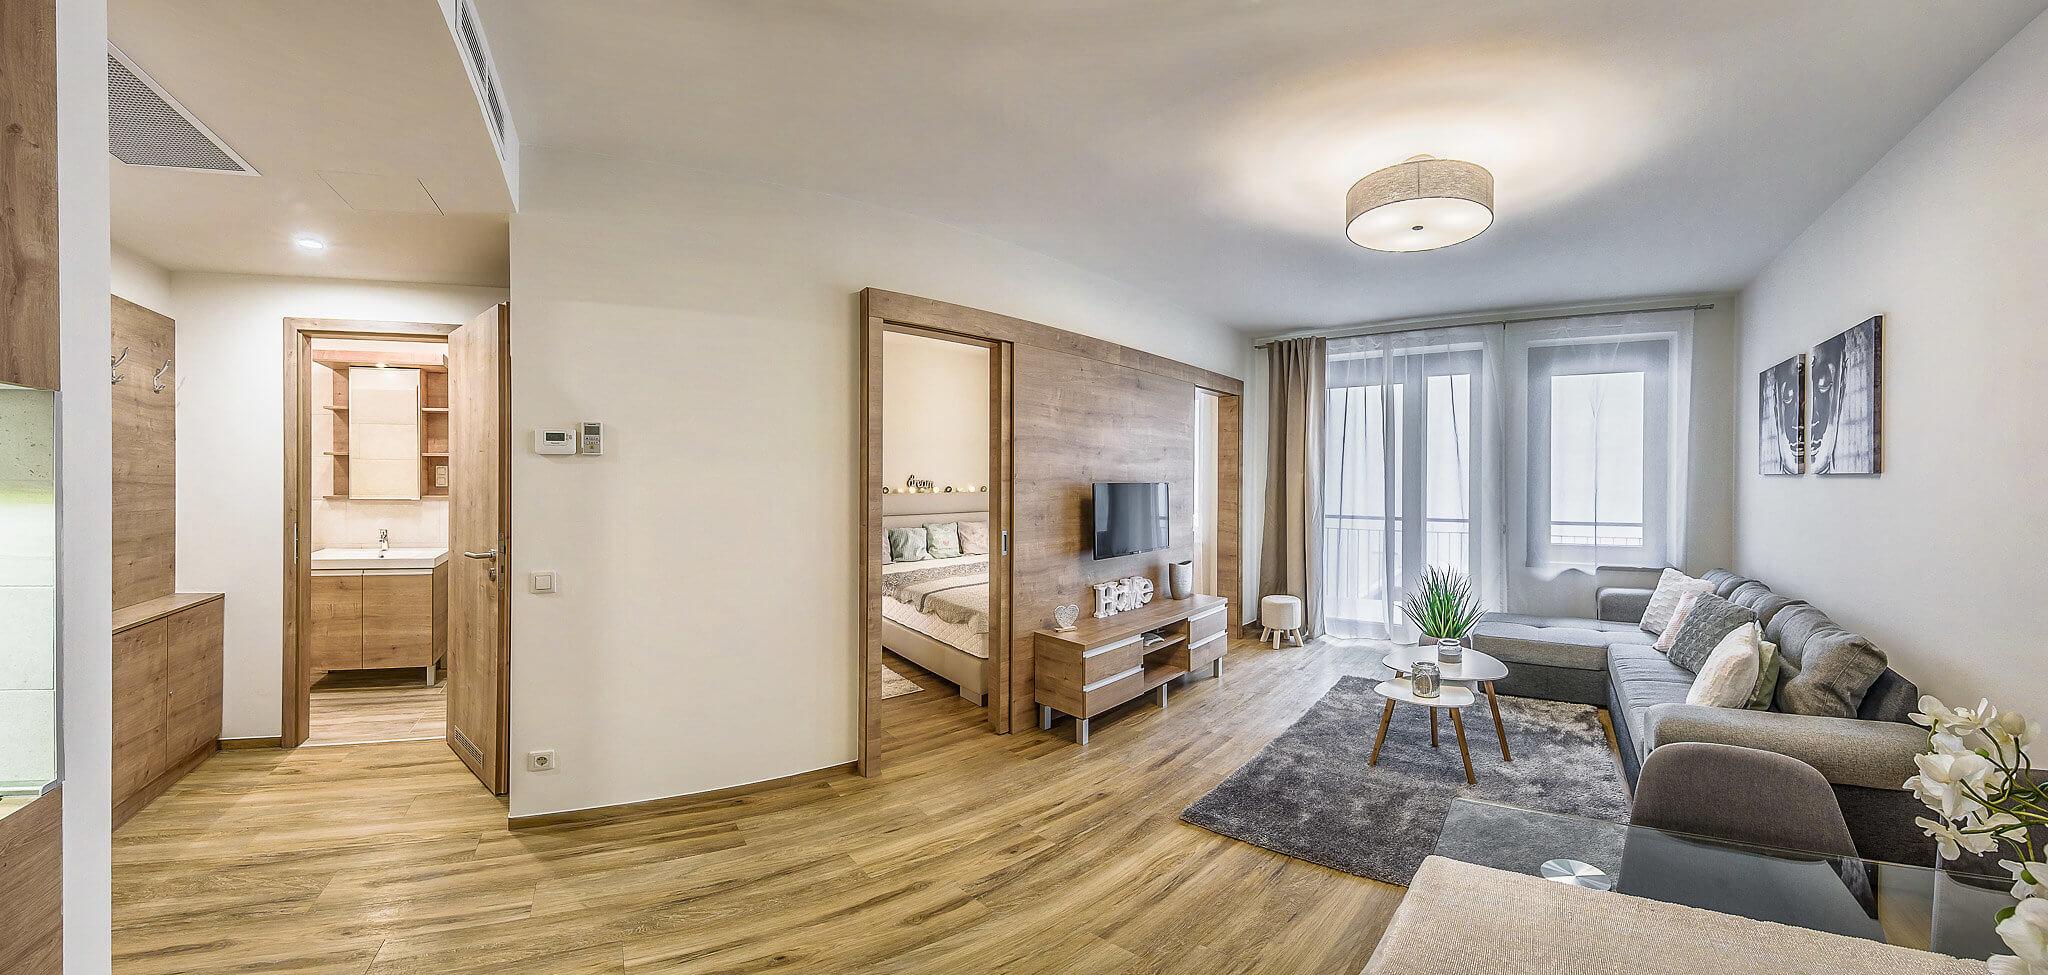 One bedroom Standard 4 - Art Homes Budapest